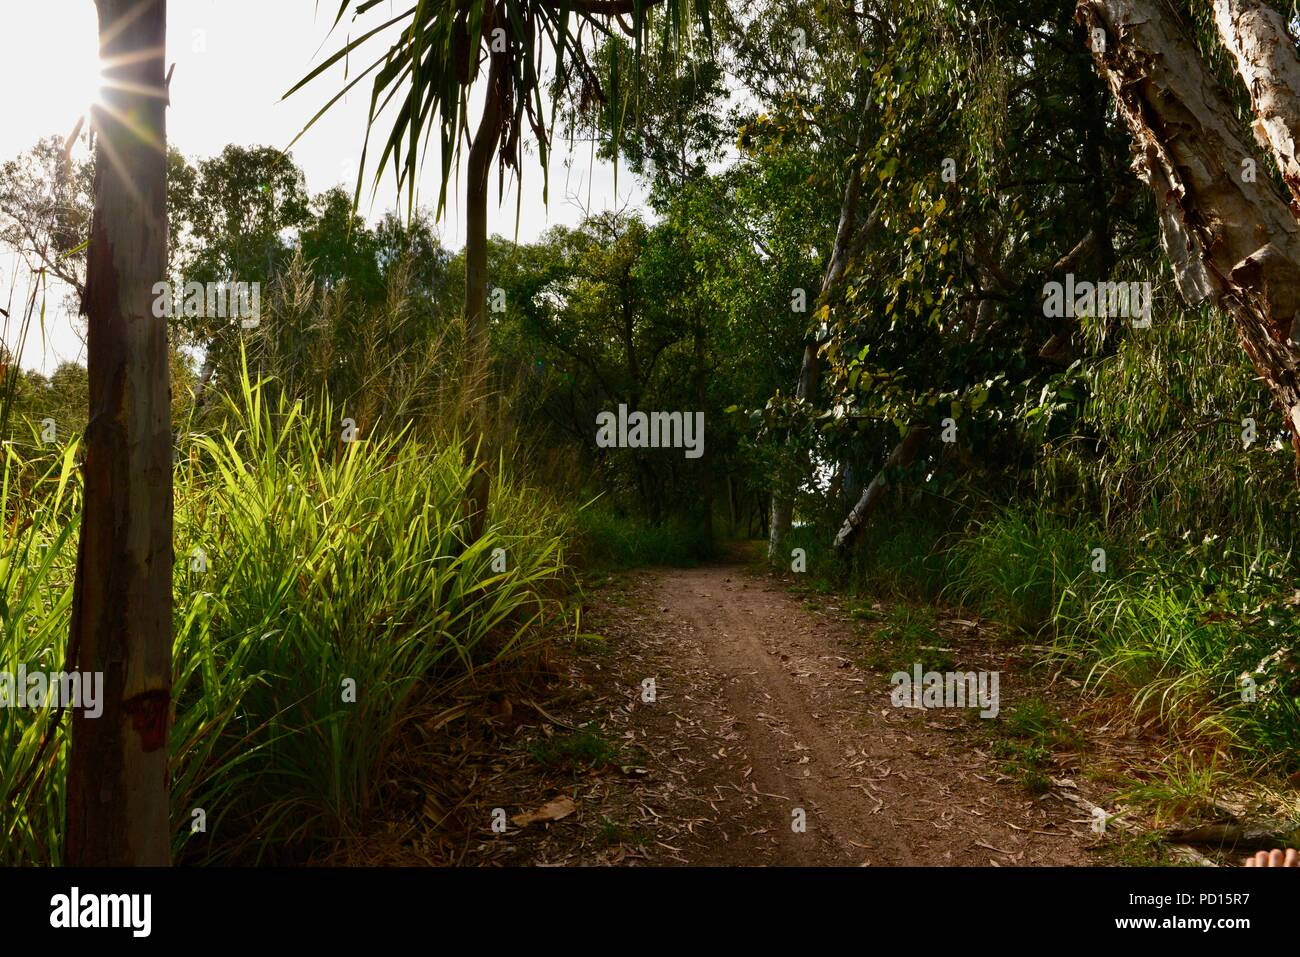 Booroona walking trail on the Ross River, Rasmussen QLD 4815, Australia Stock Photo